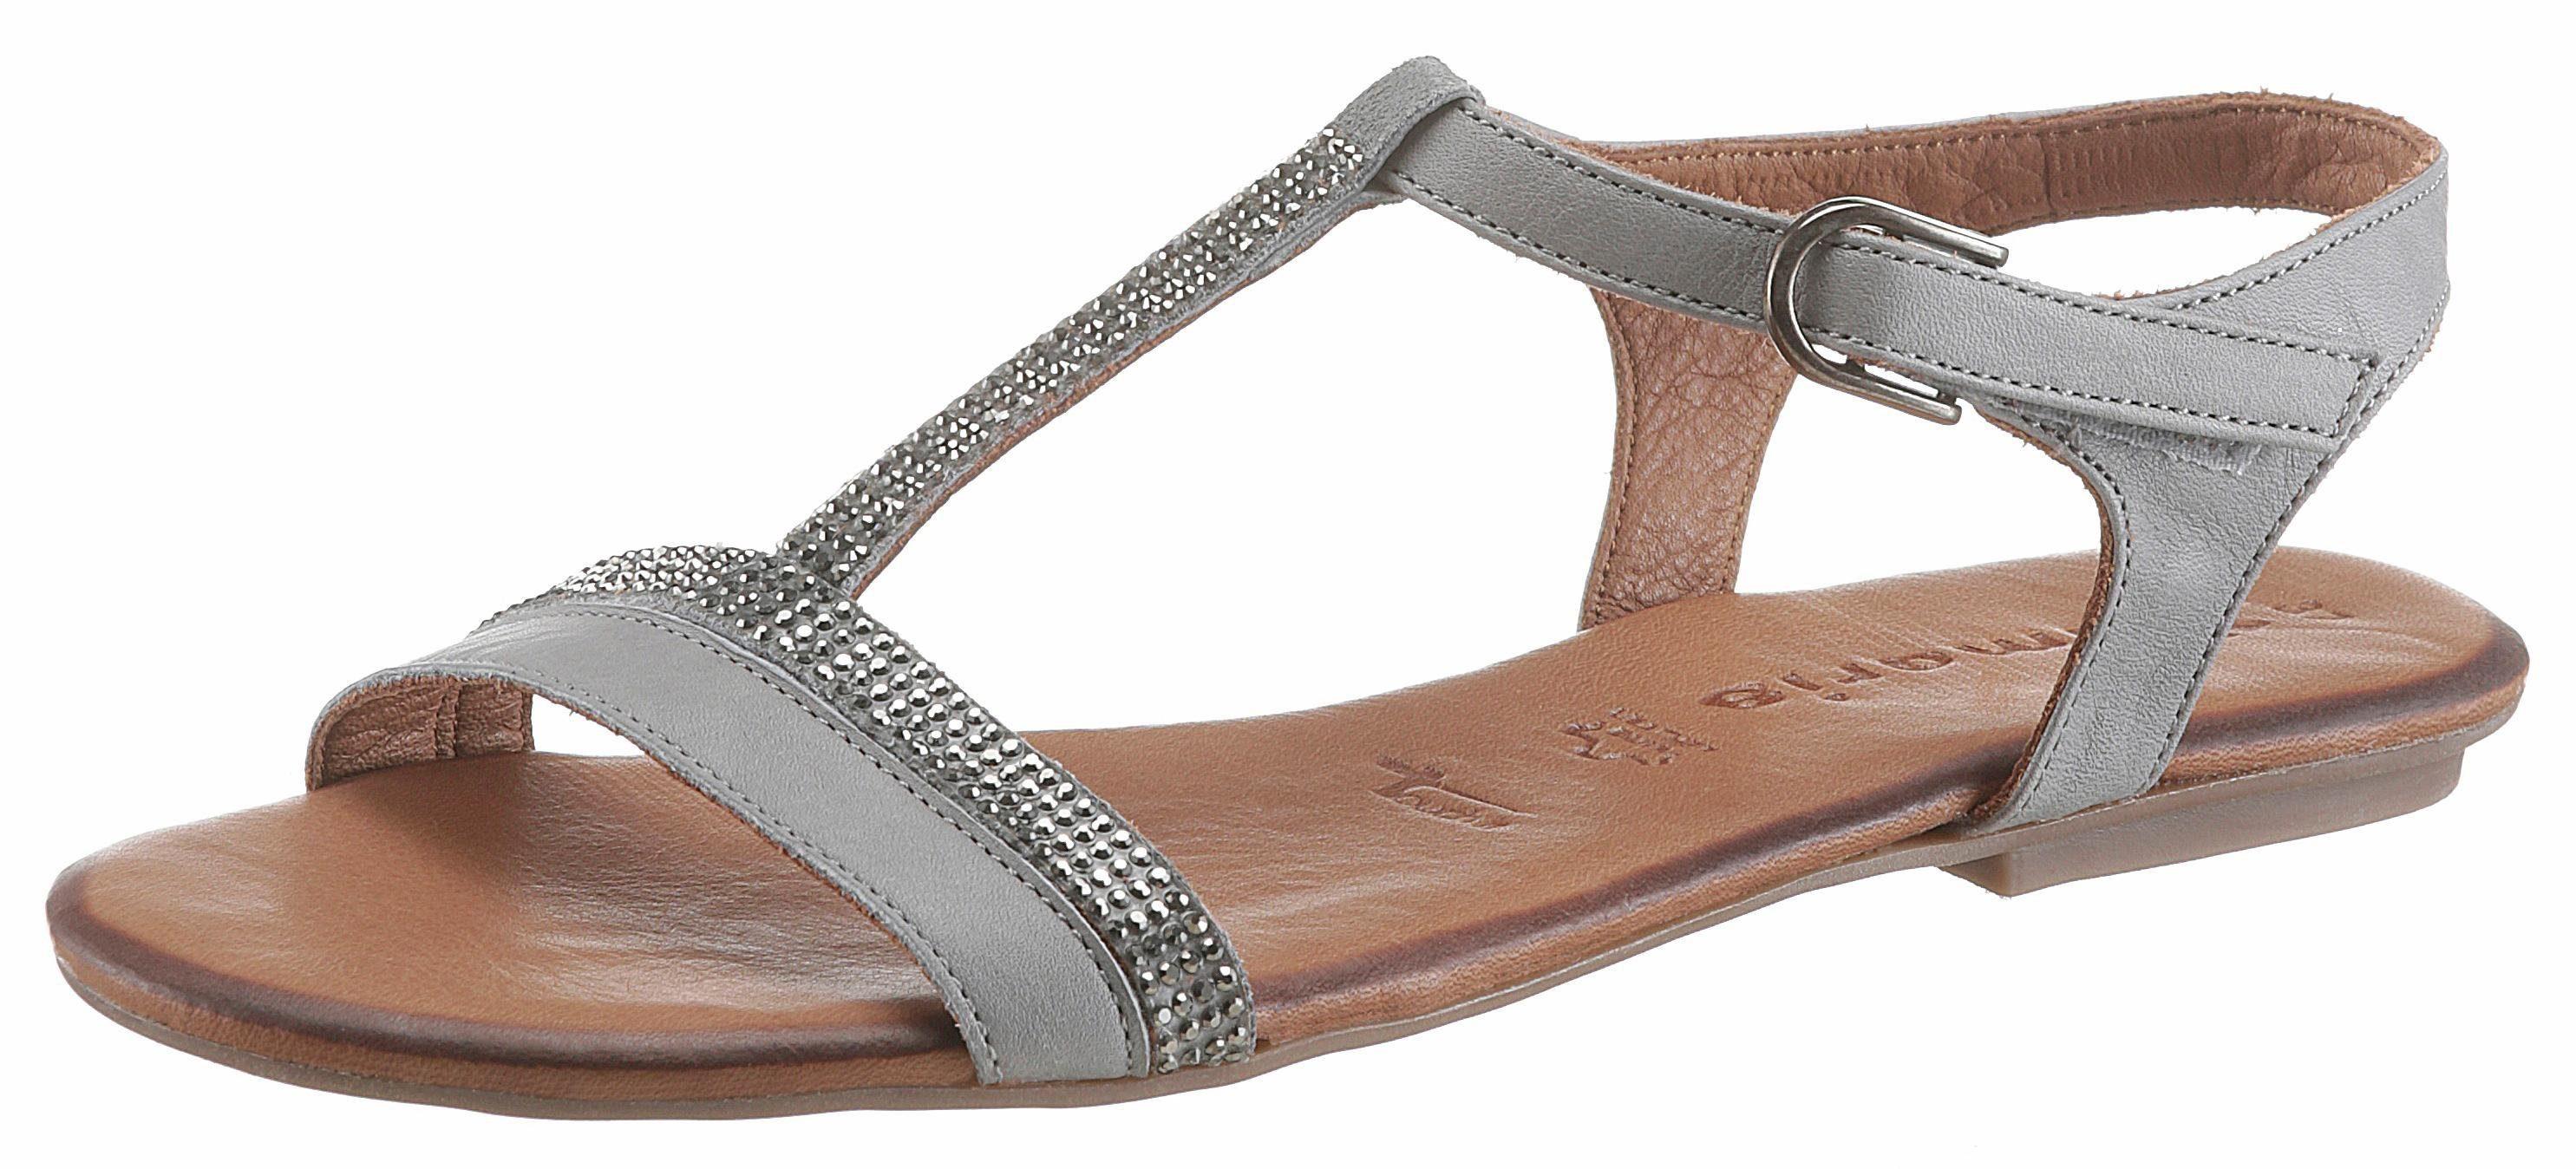 Tamaris Sandale, mit Nieten, grau, grau